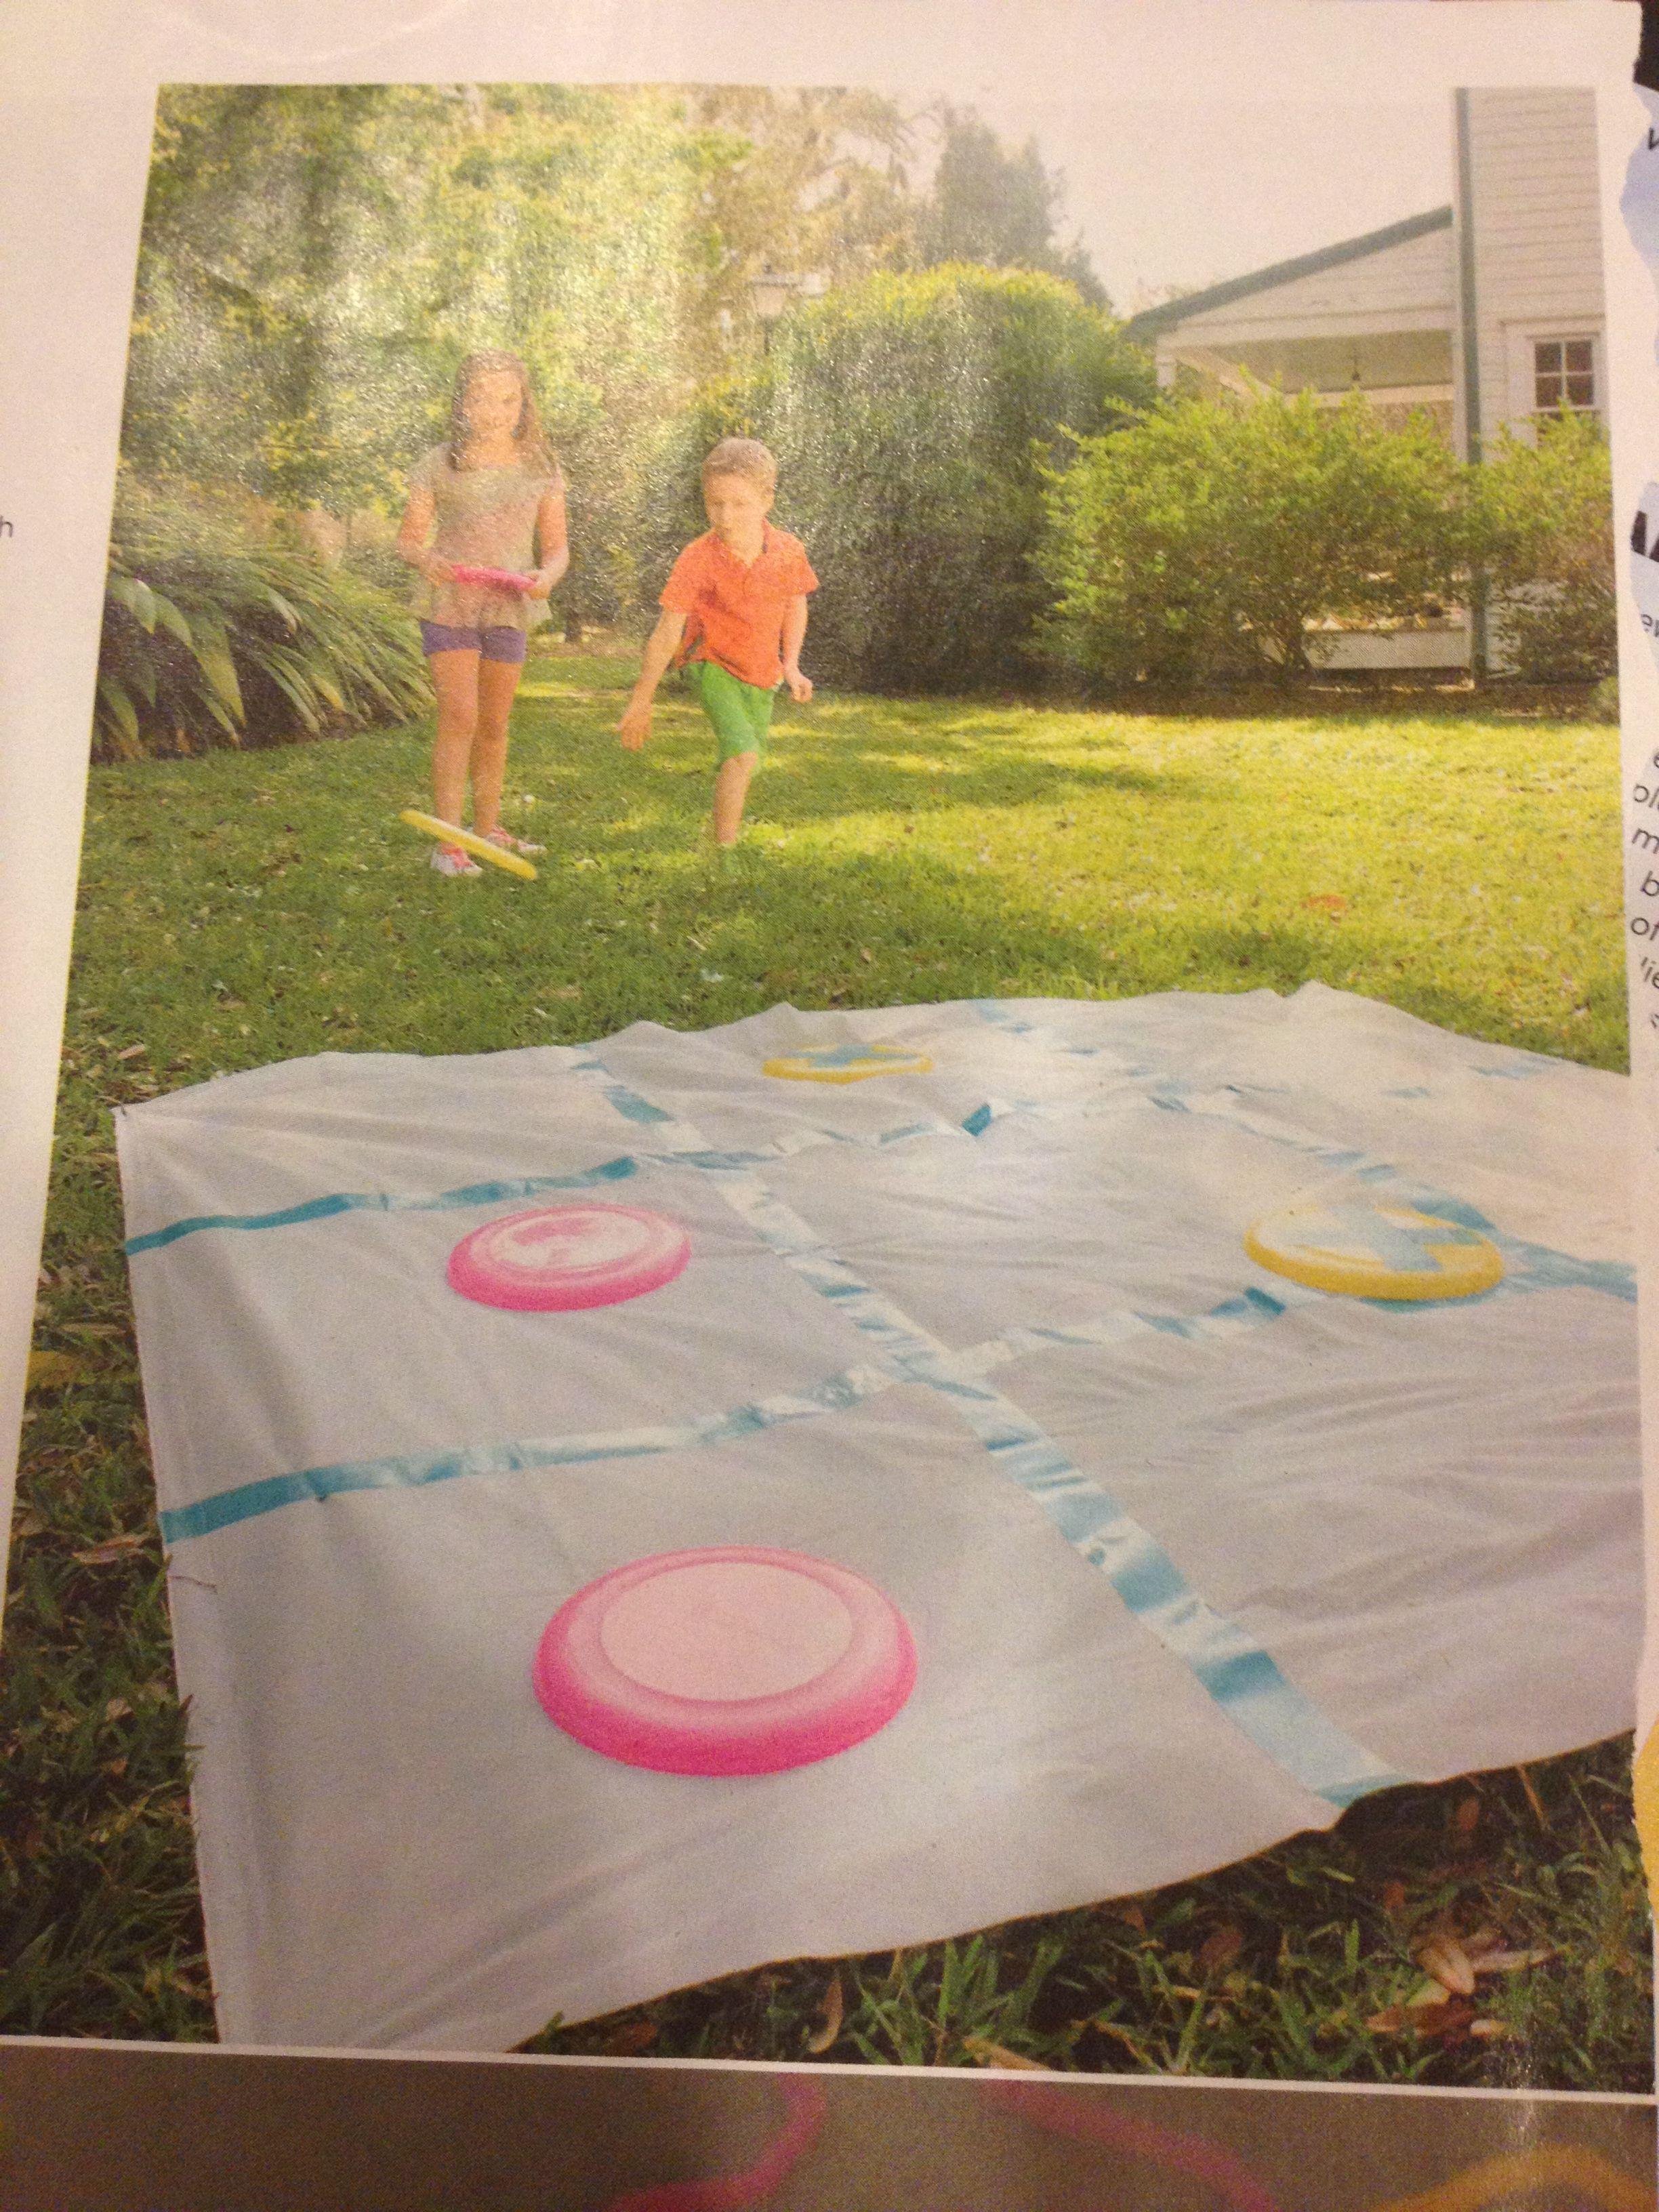 tic-tac-toss with frisbees | kids- indoor